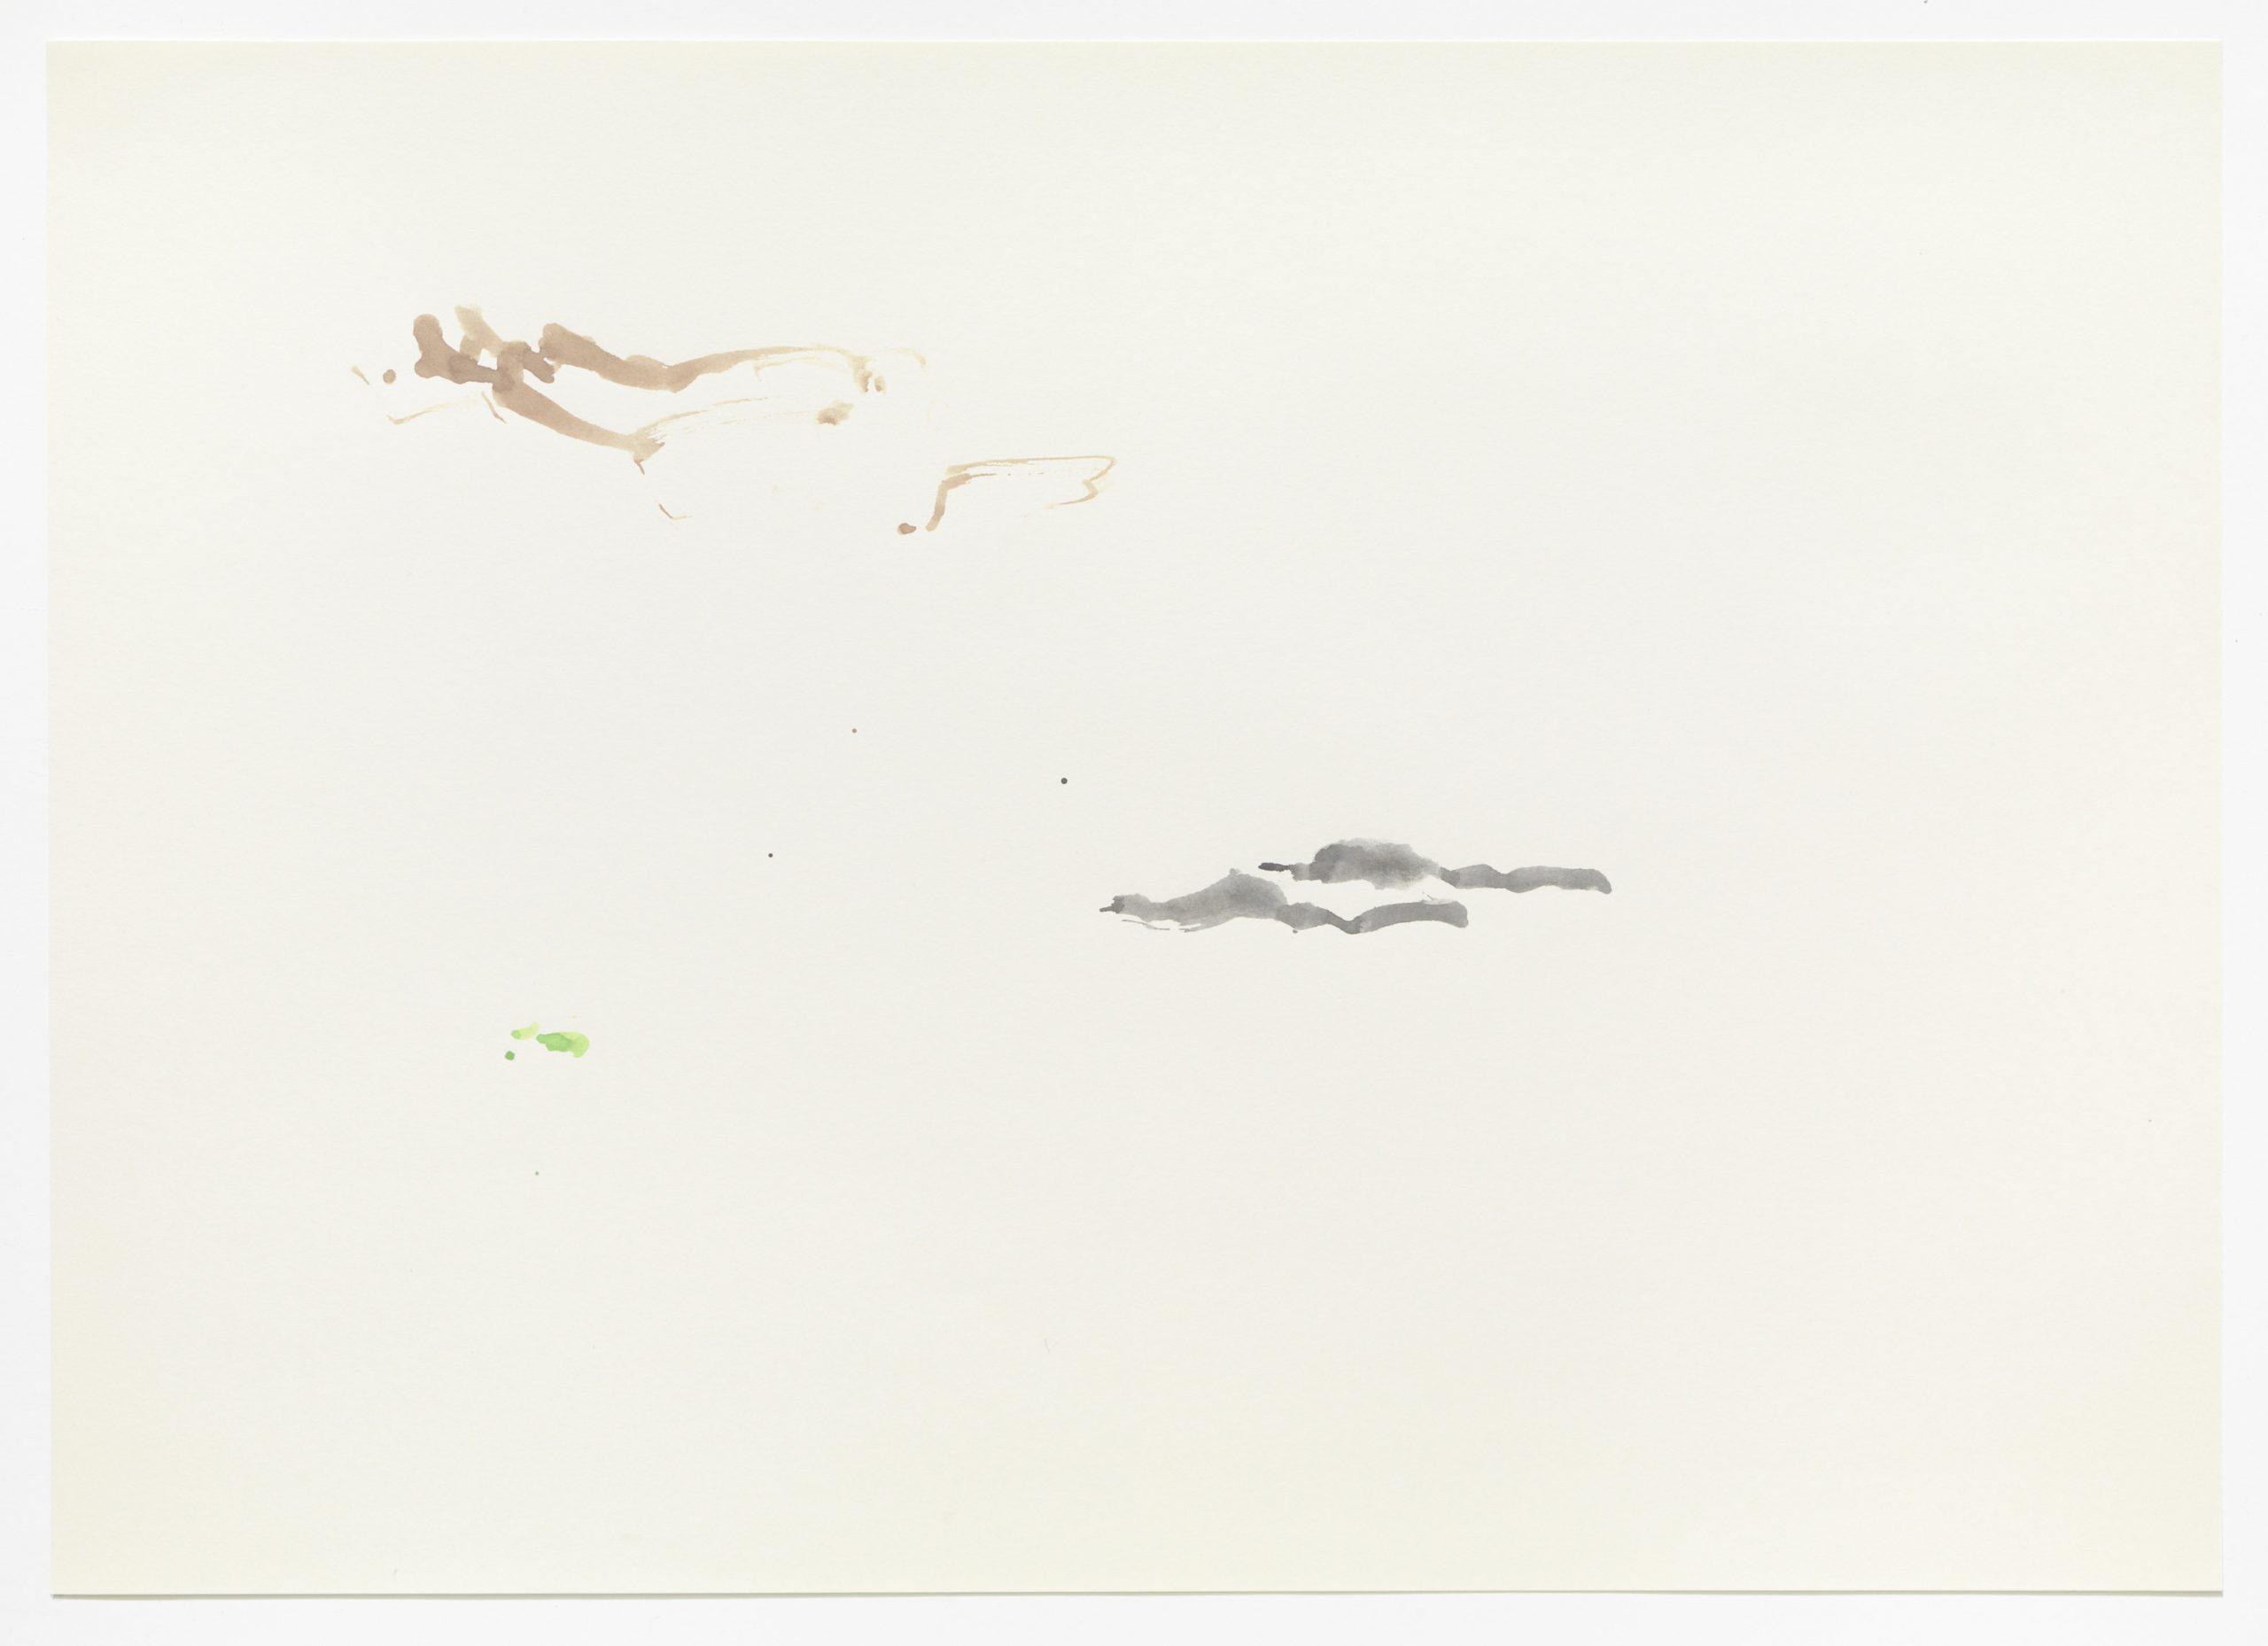 Anke Mila Menck, Aus der Serie Wolkenhände, 2019 Aquarell